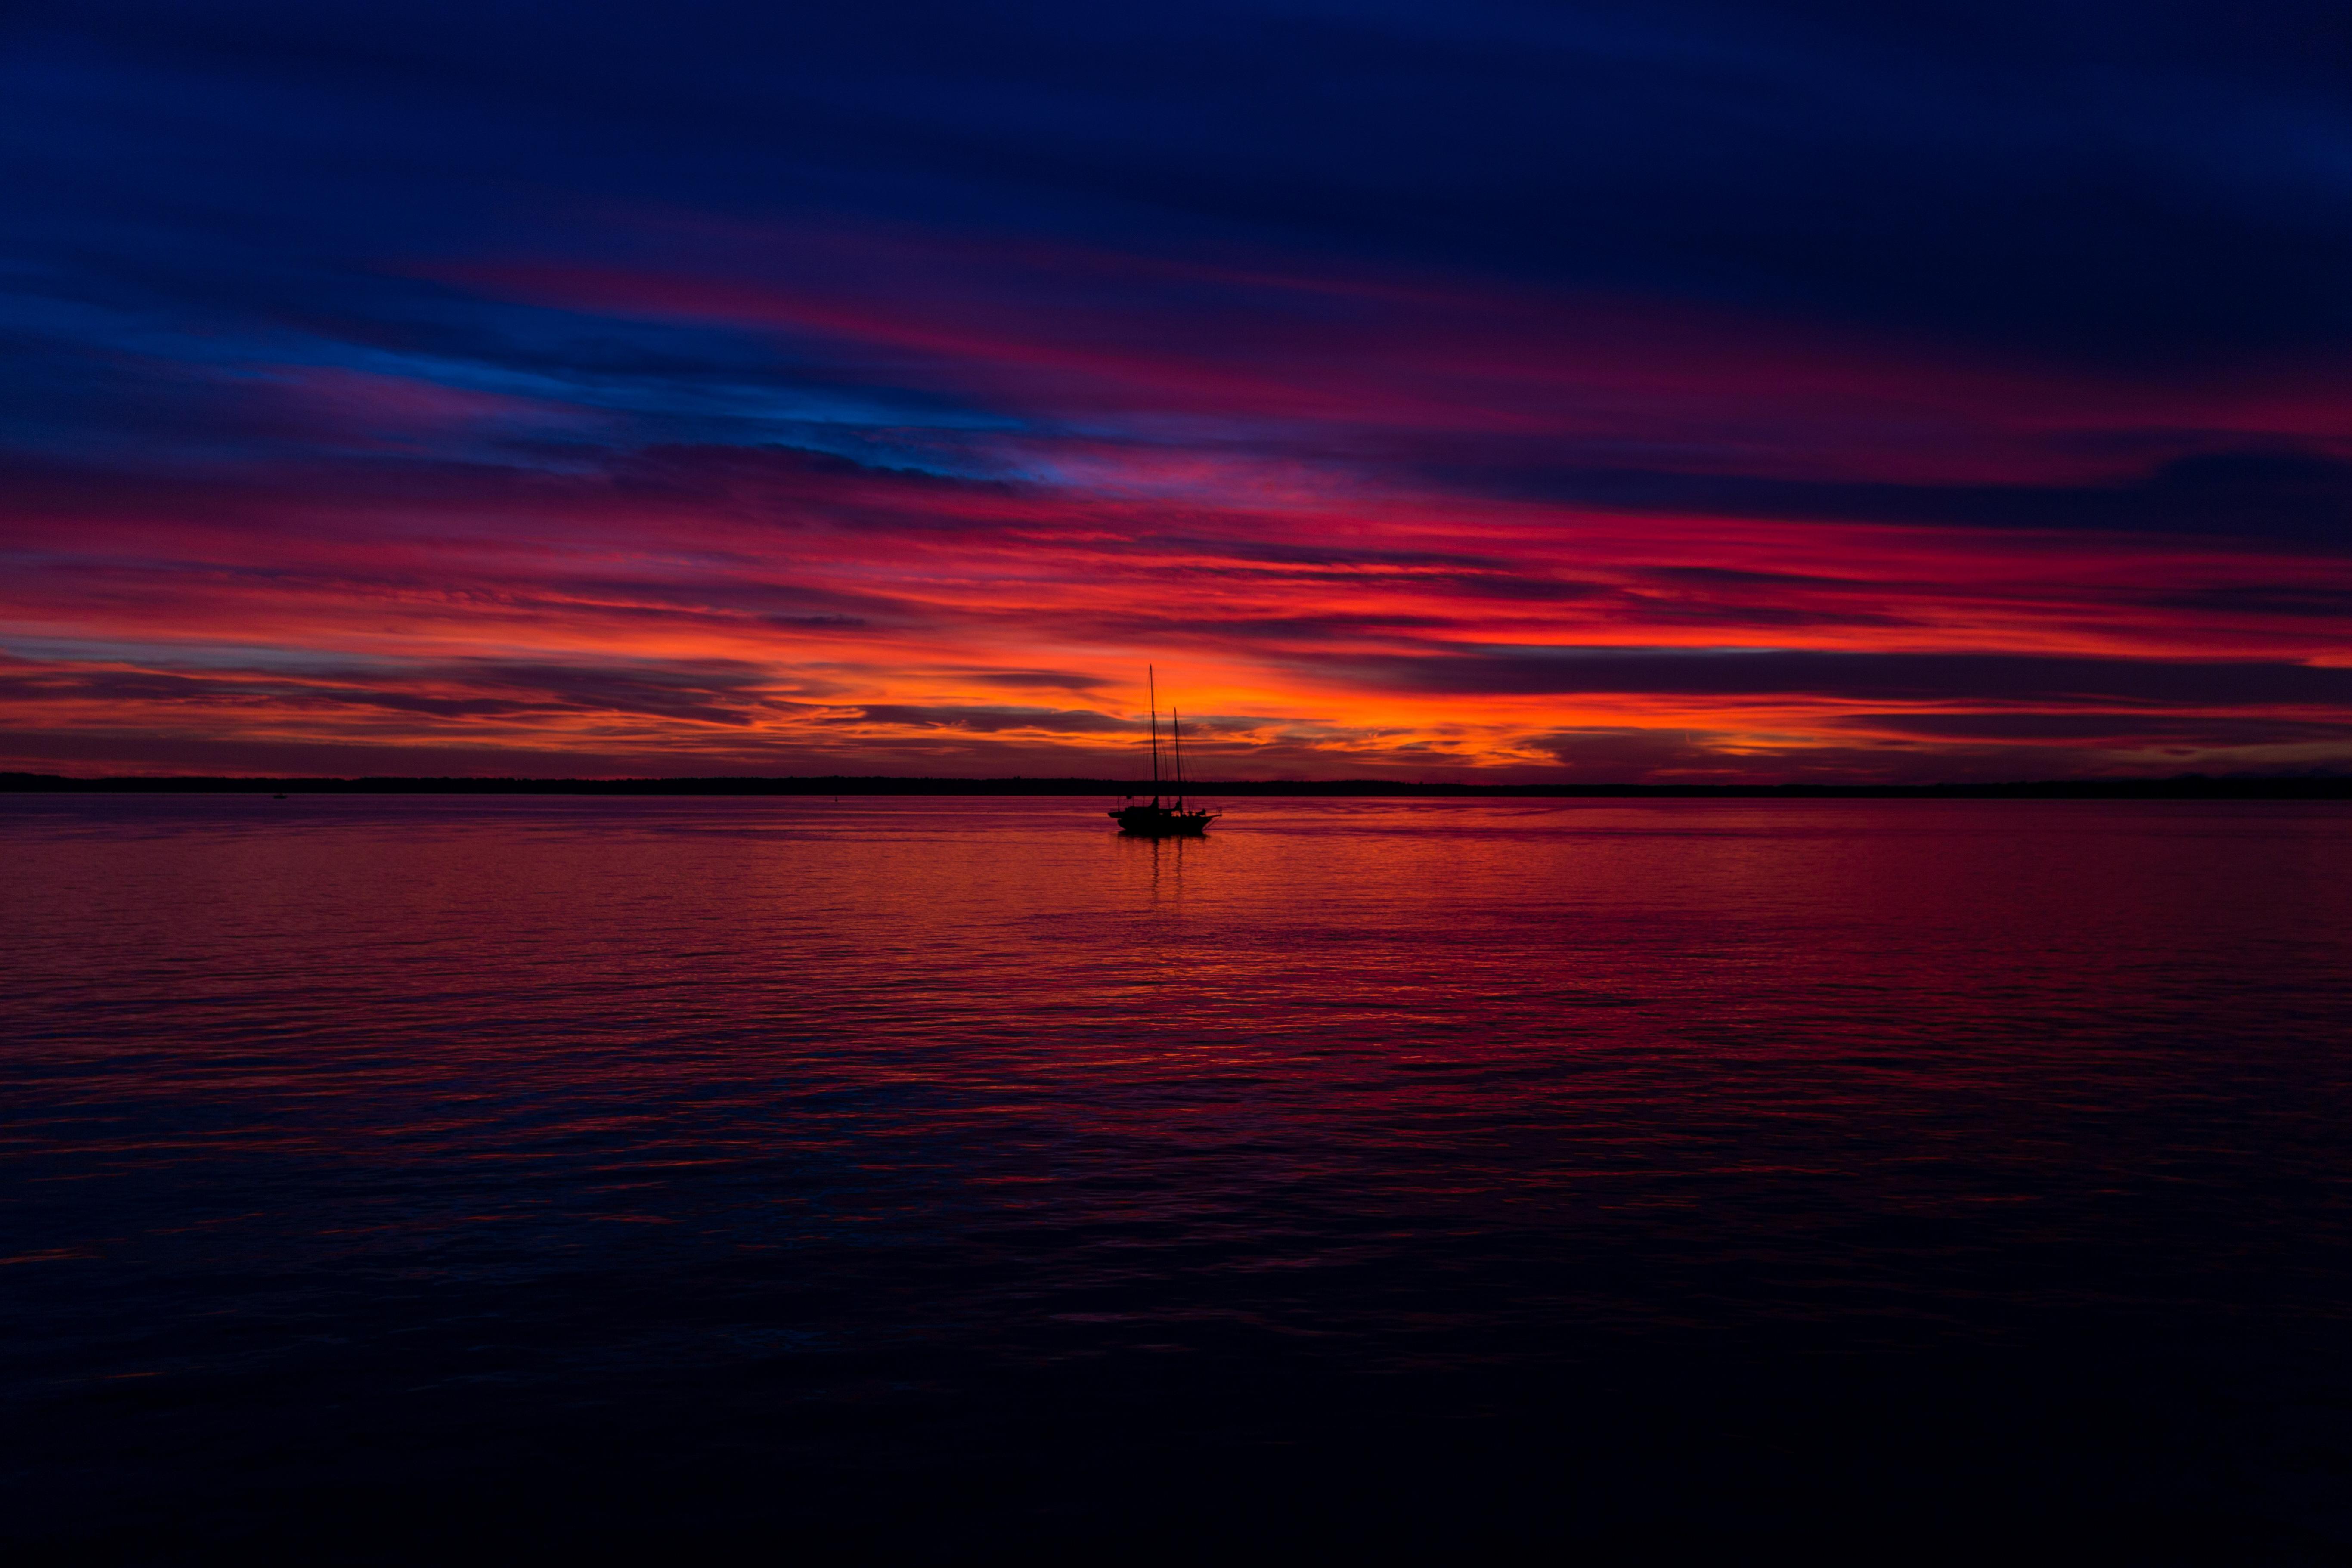 Sailing on the lake at sunset, boat, sailboat, sunset, sun, light, sky, cyan, orange, horizon, boat, nature, outdoors, night, evening